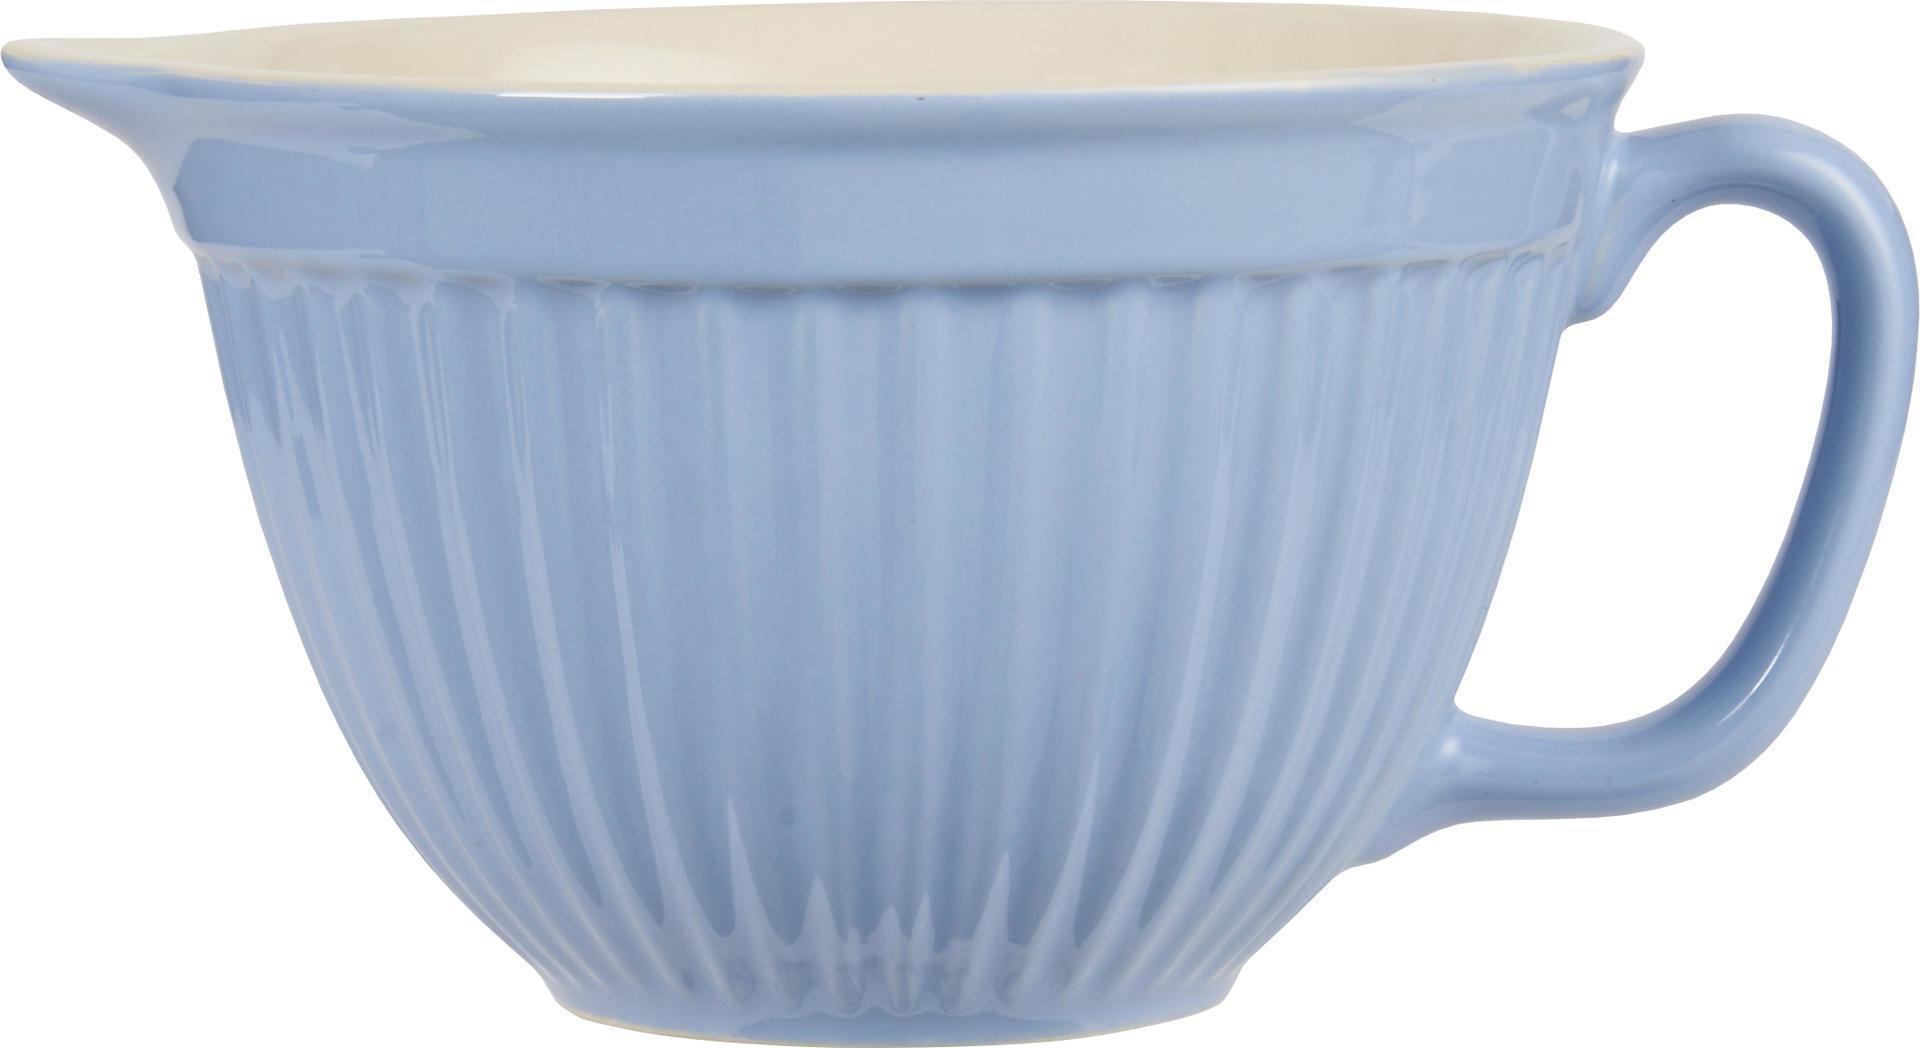 IB LAURSEN Mísa na těsto Mynte nordic sky, modrá barva, keramika